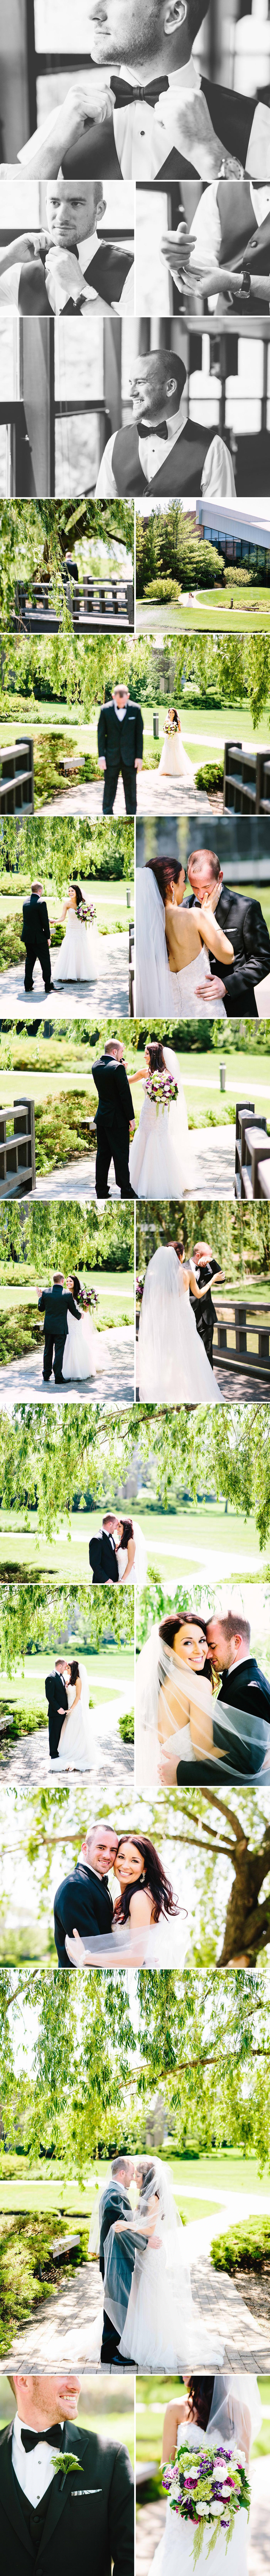 chicago-fine-art-wedding-photography-alger2